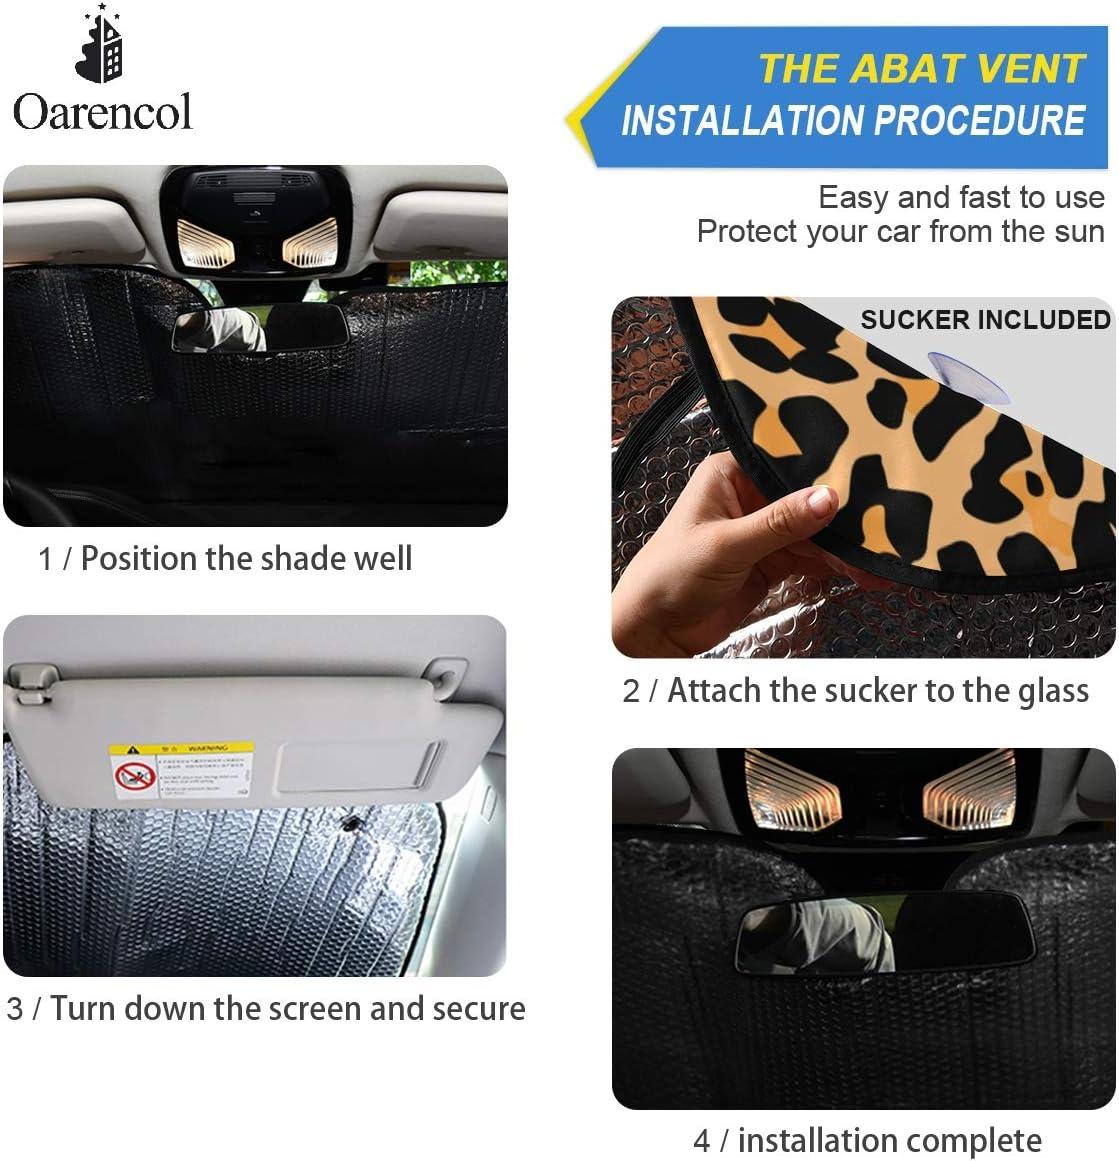 55 x 27.6 Oarencol Women Makeup Eyes Car Windshield Sun Shade Foldable UV Ray Sun Visor Protector Sunshade to Keep Your Vehicle Cool